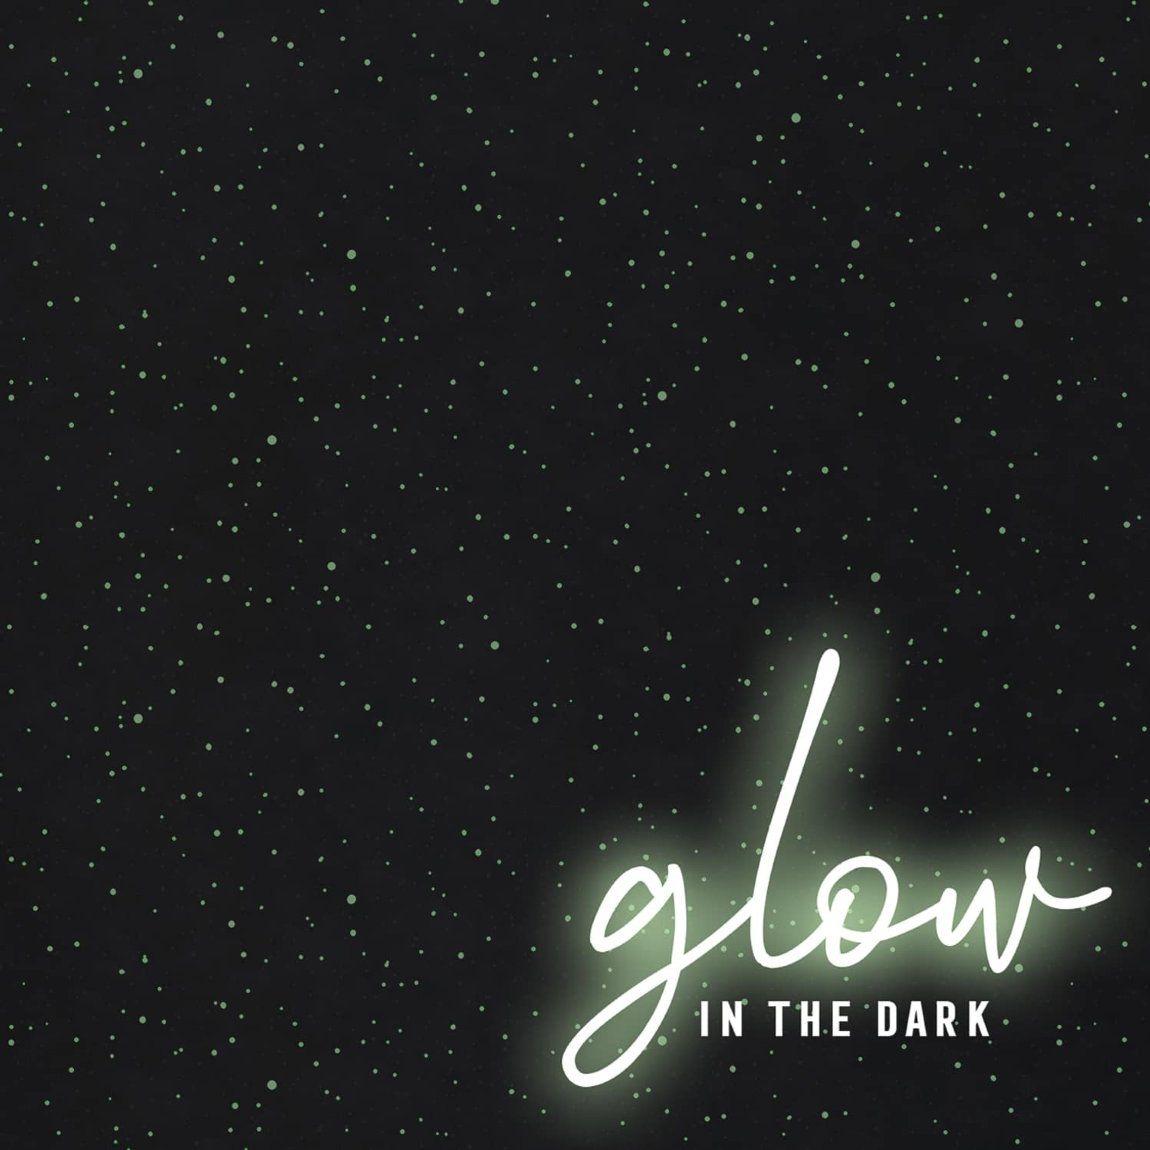 Glow In The Dark Constellation Wallpaper Kids Wallpaper B M Dark Wallpaper Glow In The Dark Moody Wallpaper